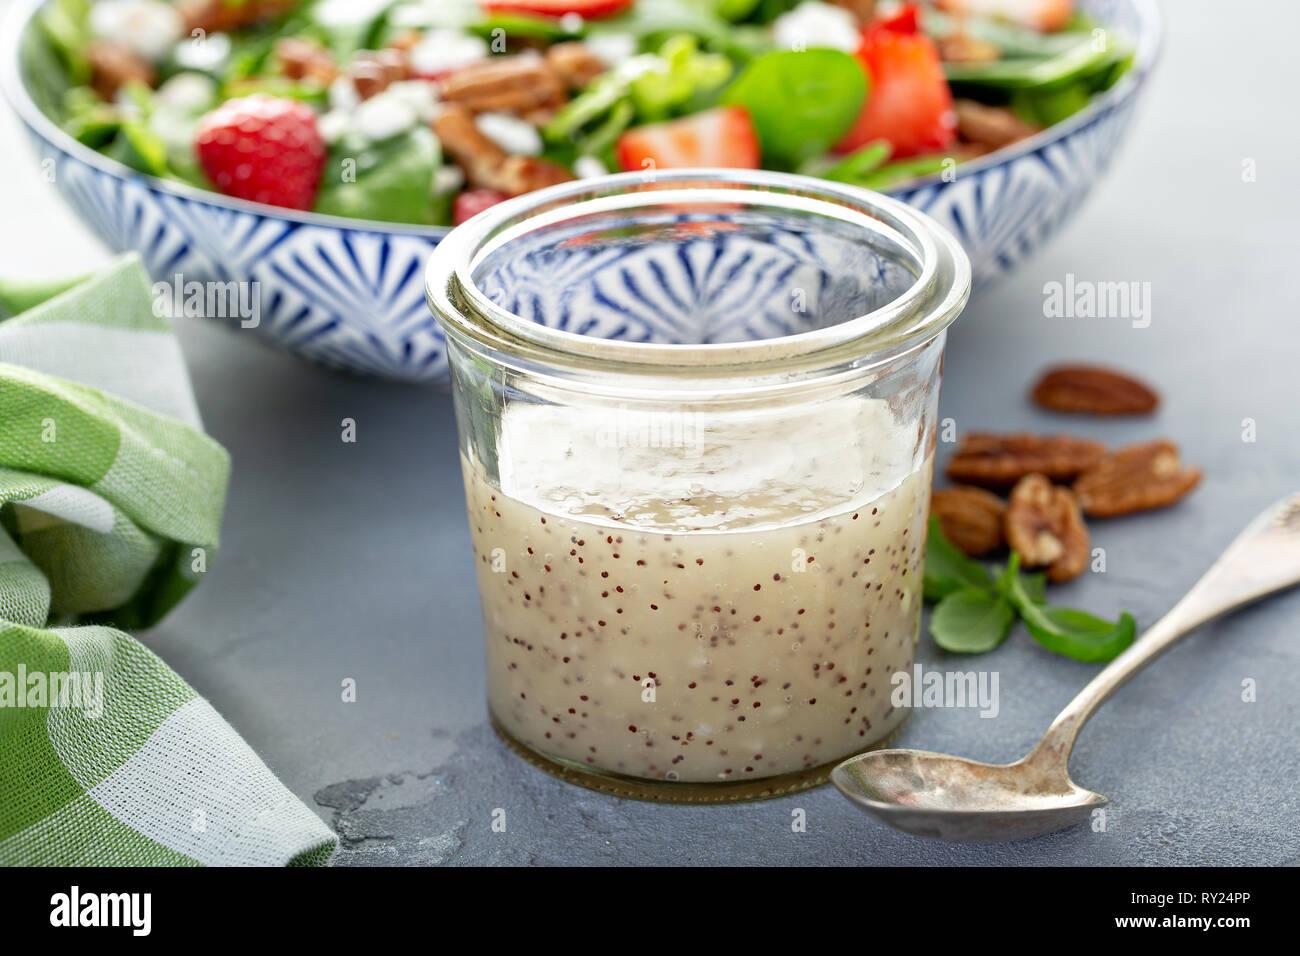 Homemade poppyseed salad dressing - Stock Image